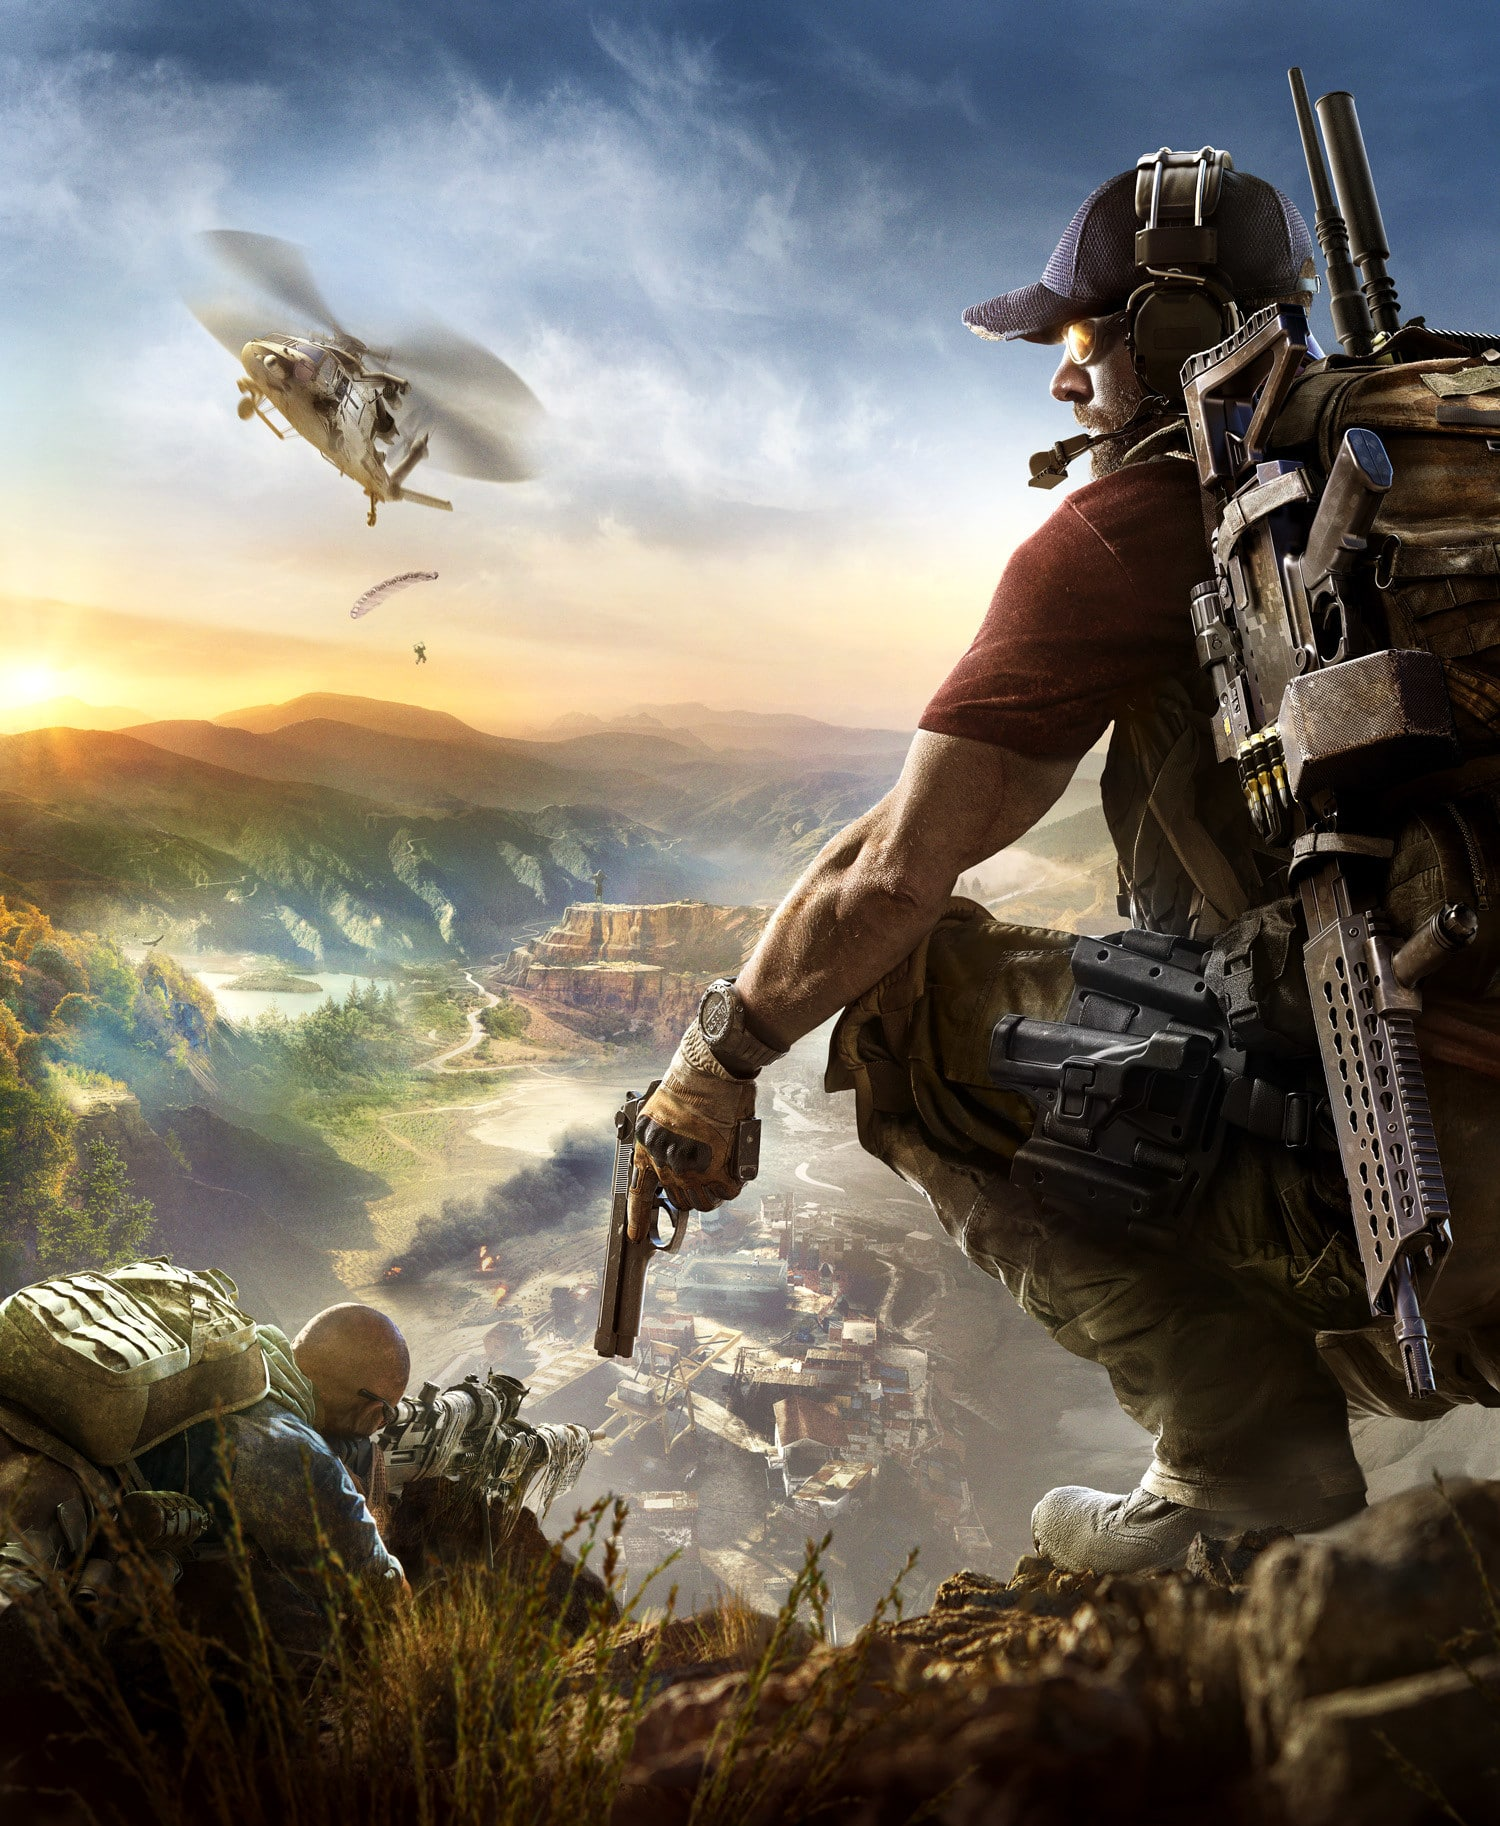 Tom Clancy's Ghost Recon Wildlands, Beta Test Weekend Review